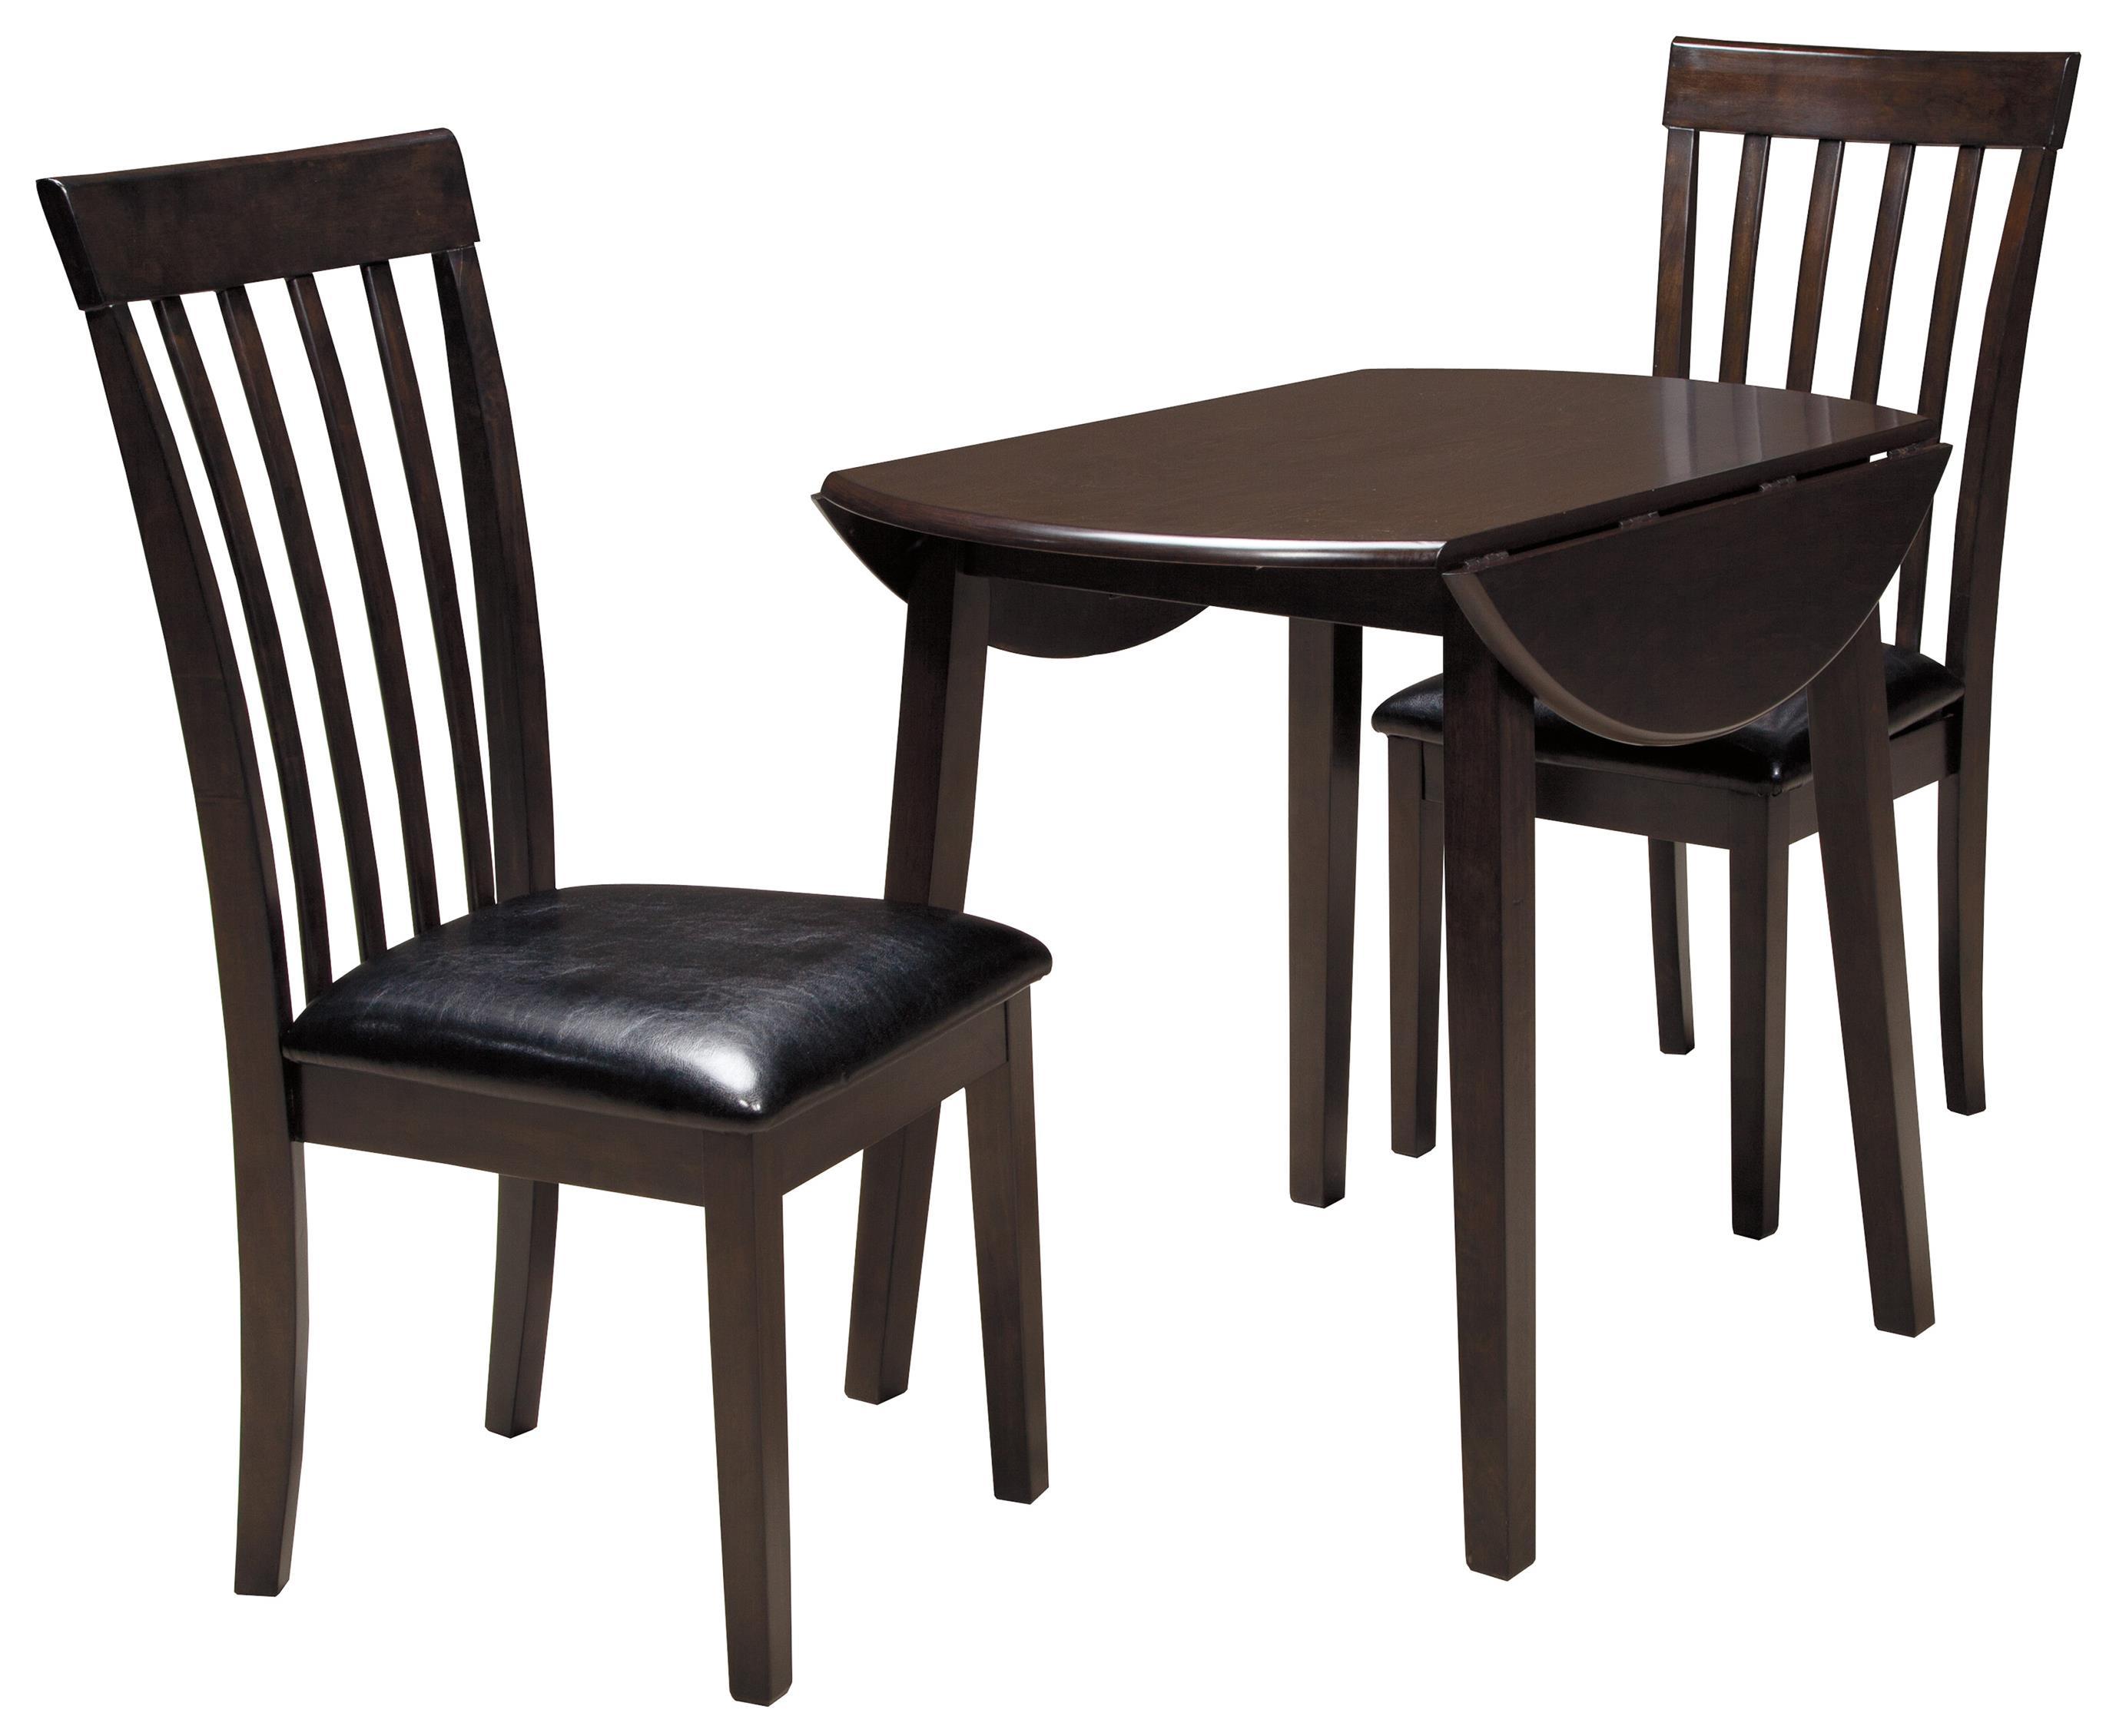 Ashley Signature Design Hammis3-Piece Round Drop Leaf Table Set ...  sc 1 st  Dunk \u0026 Bright Furniture & Ashley Signature Design Hammis 3-Piece Round Drop Leaf Table Set ...